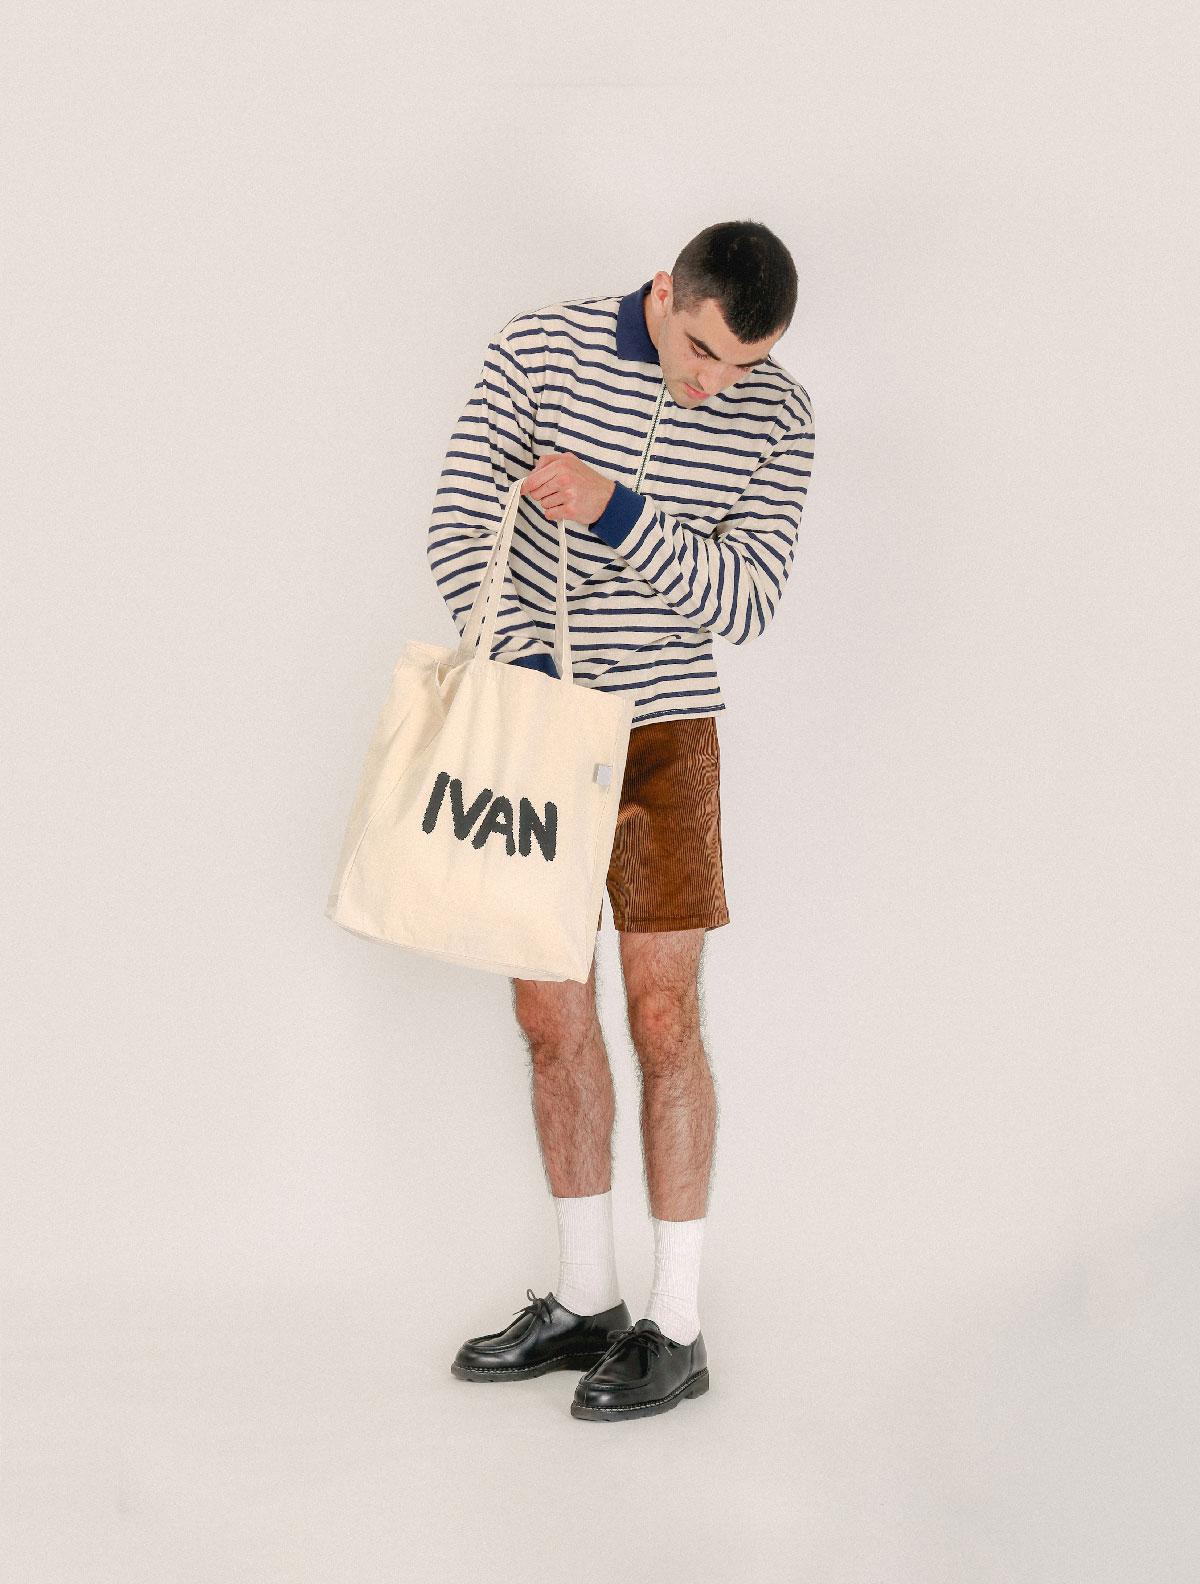 IVAN-Clothing_01